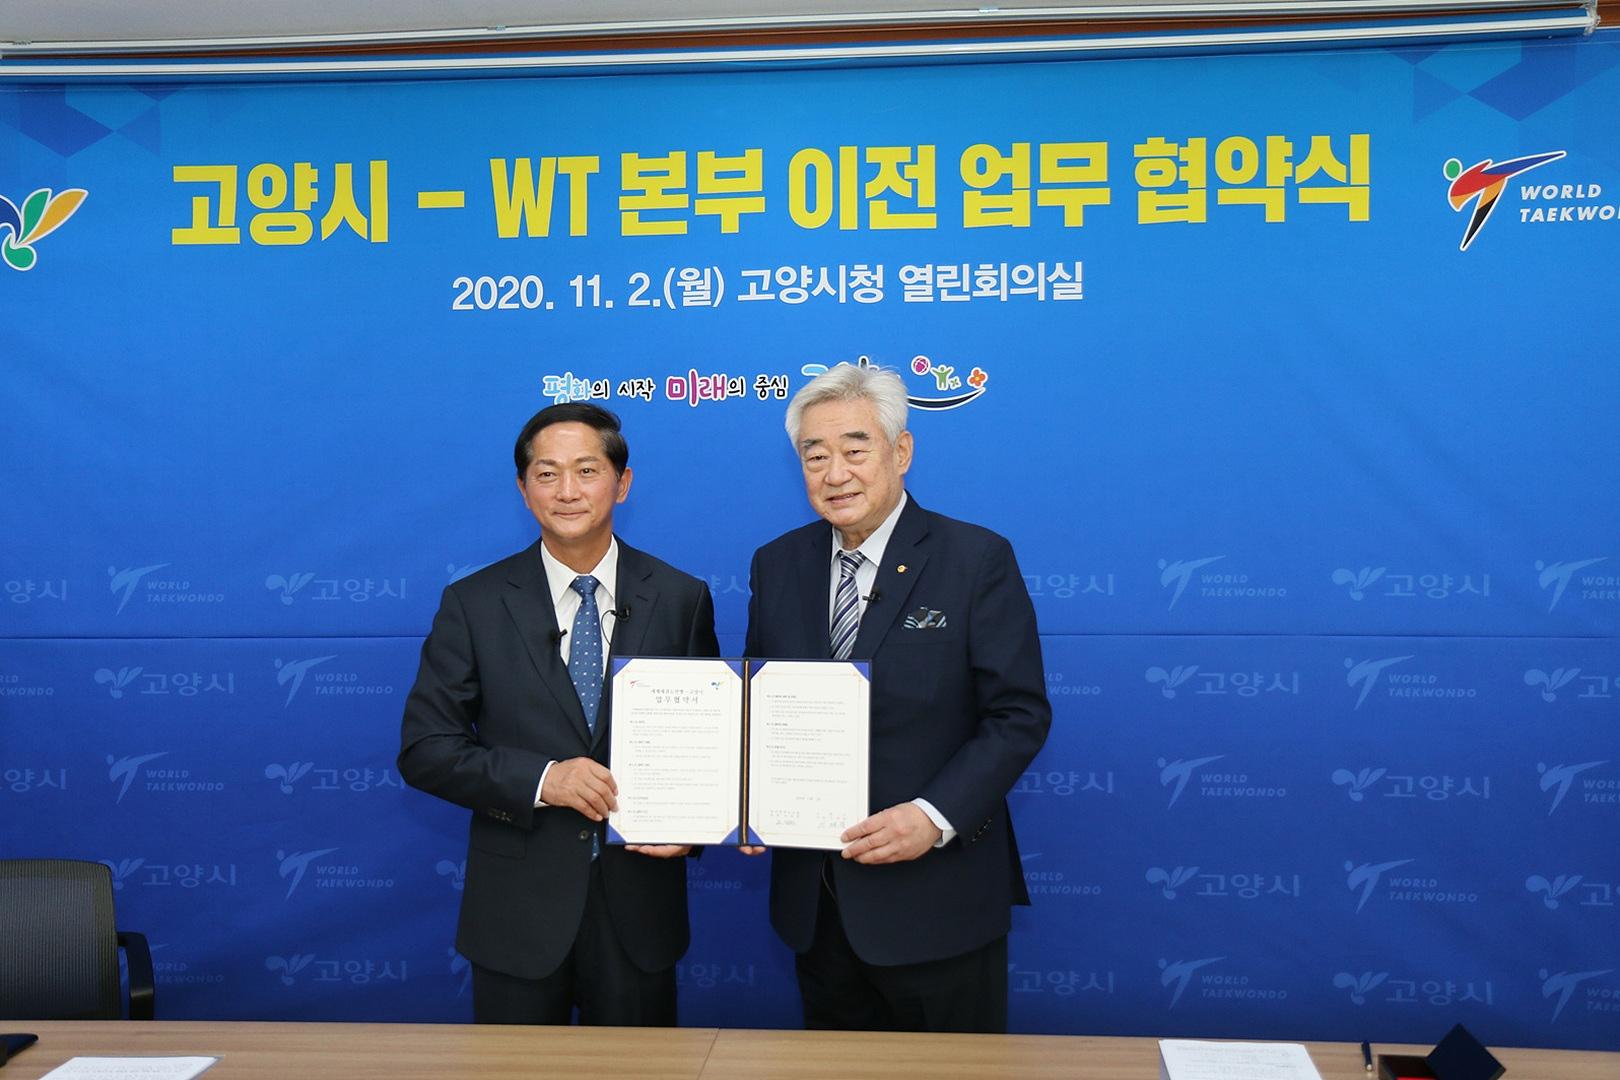 Foto: World Taekwondo President Chungwon Choue and Goyang Mayor Lee Jae-joon